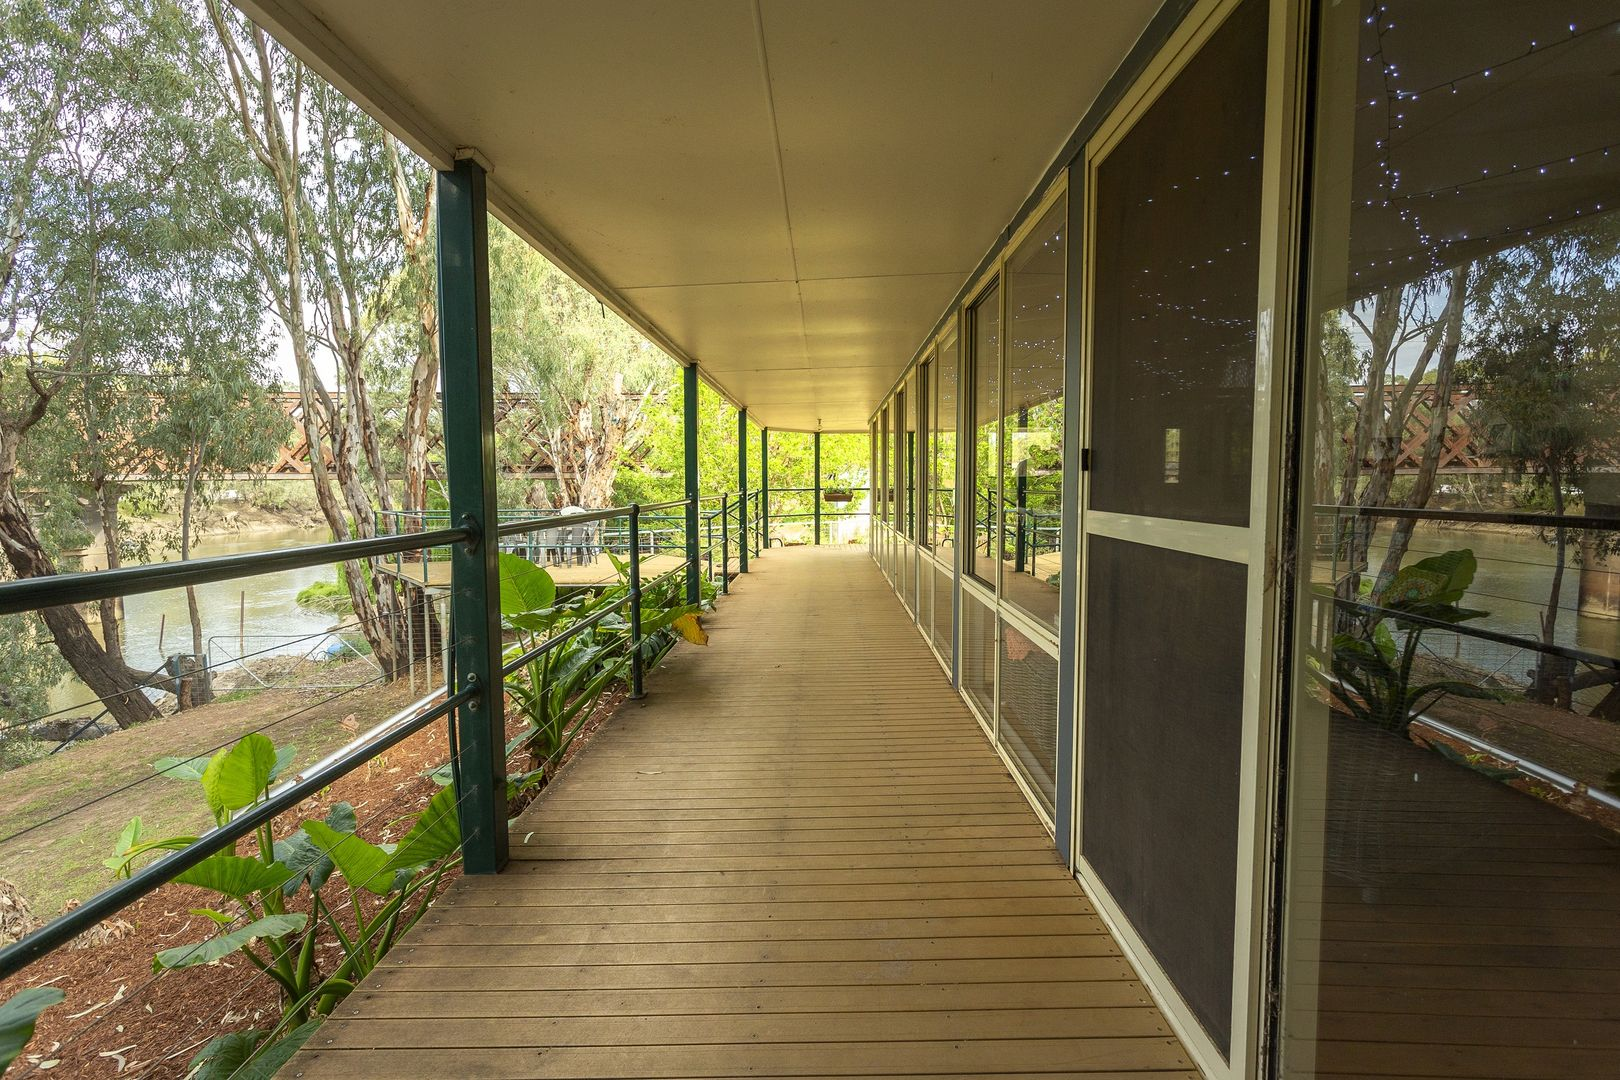 Lot 2 of 9642 Sturt Highway, Narrandera NSW 2700, Image 1